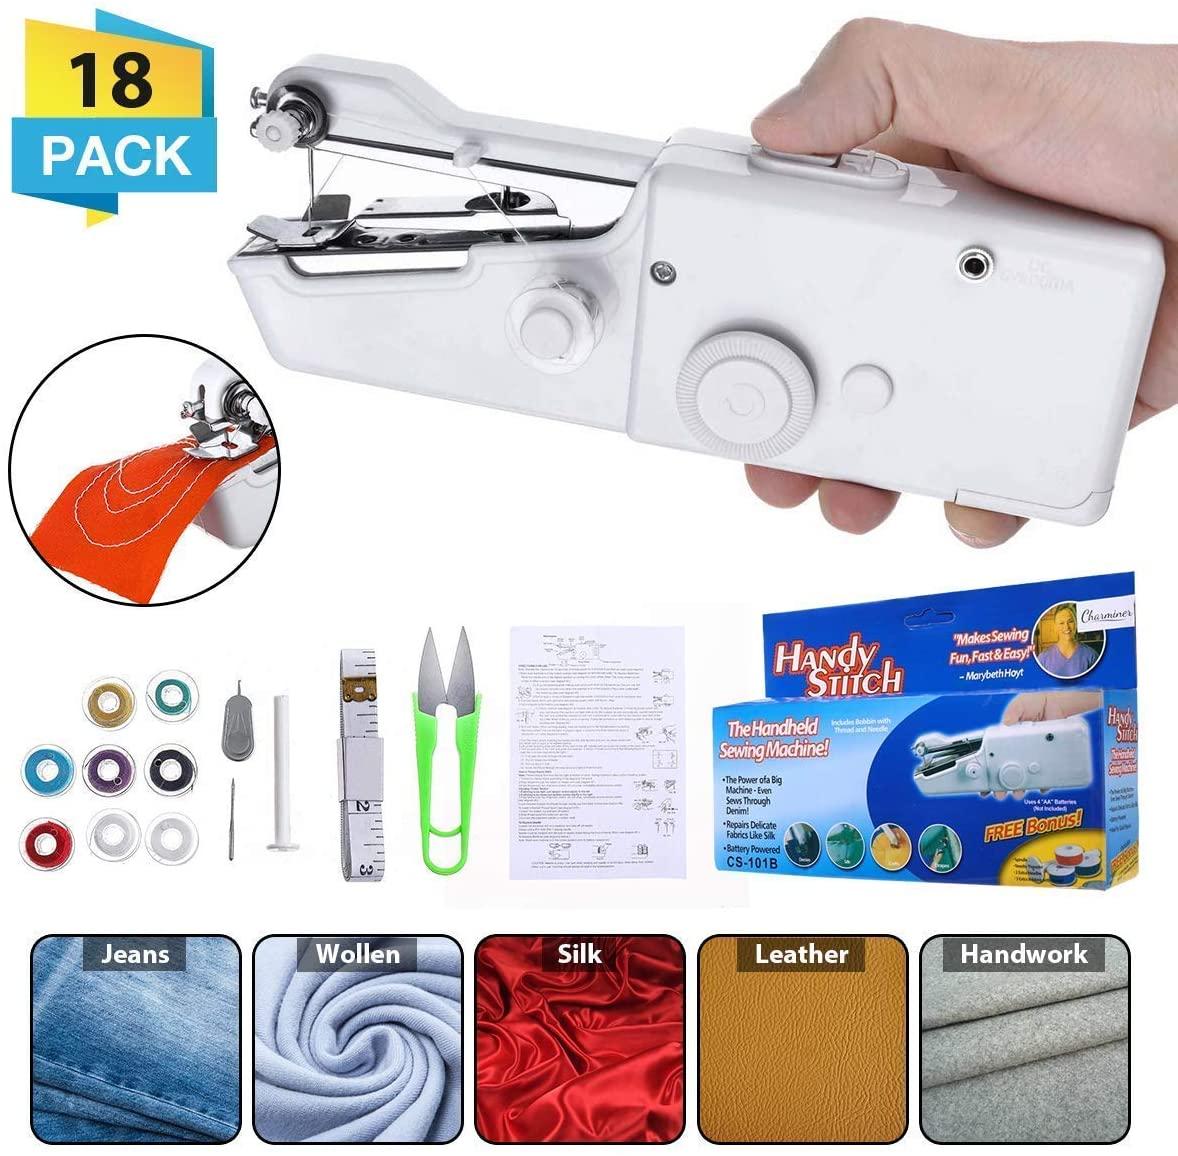 CHARMINER Hand Sewing Machine